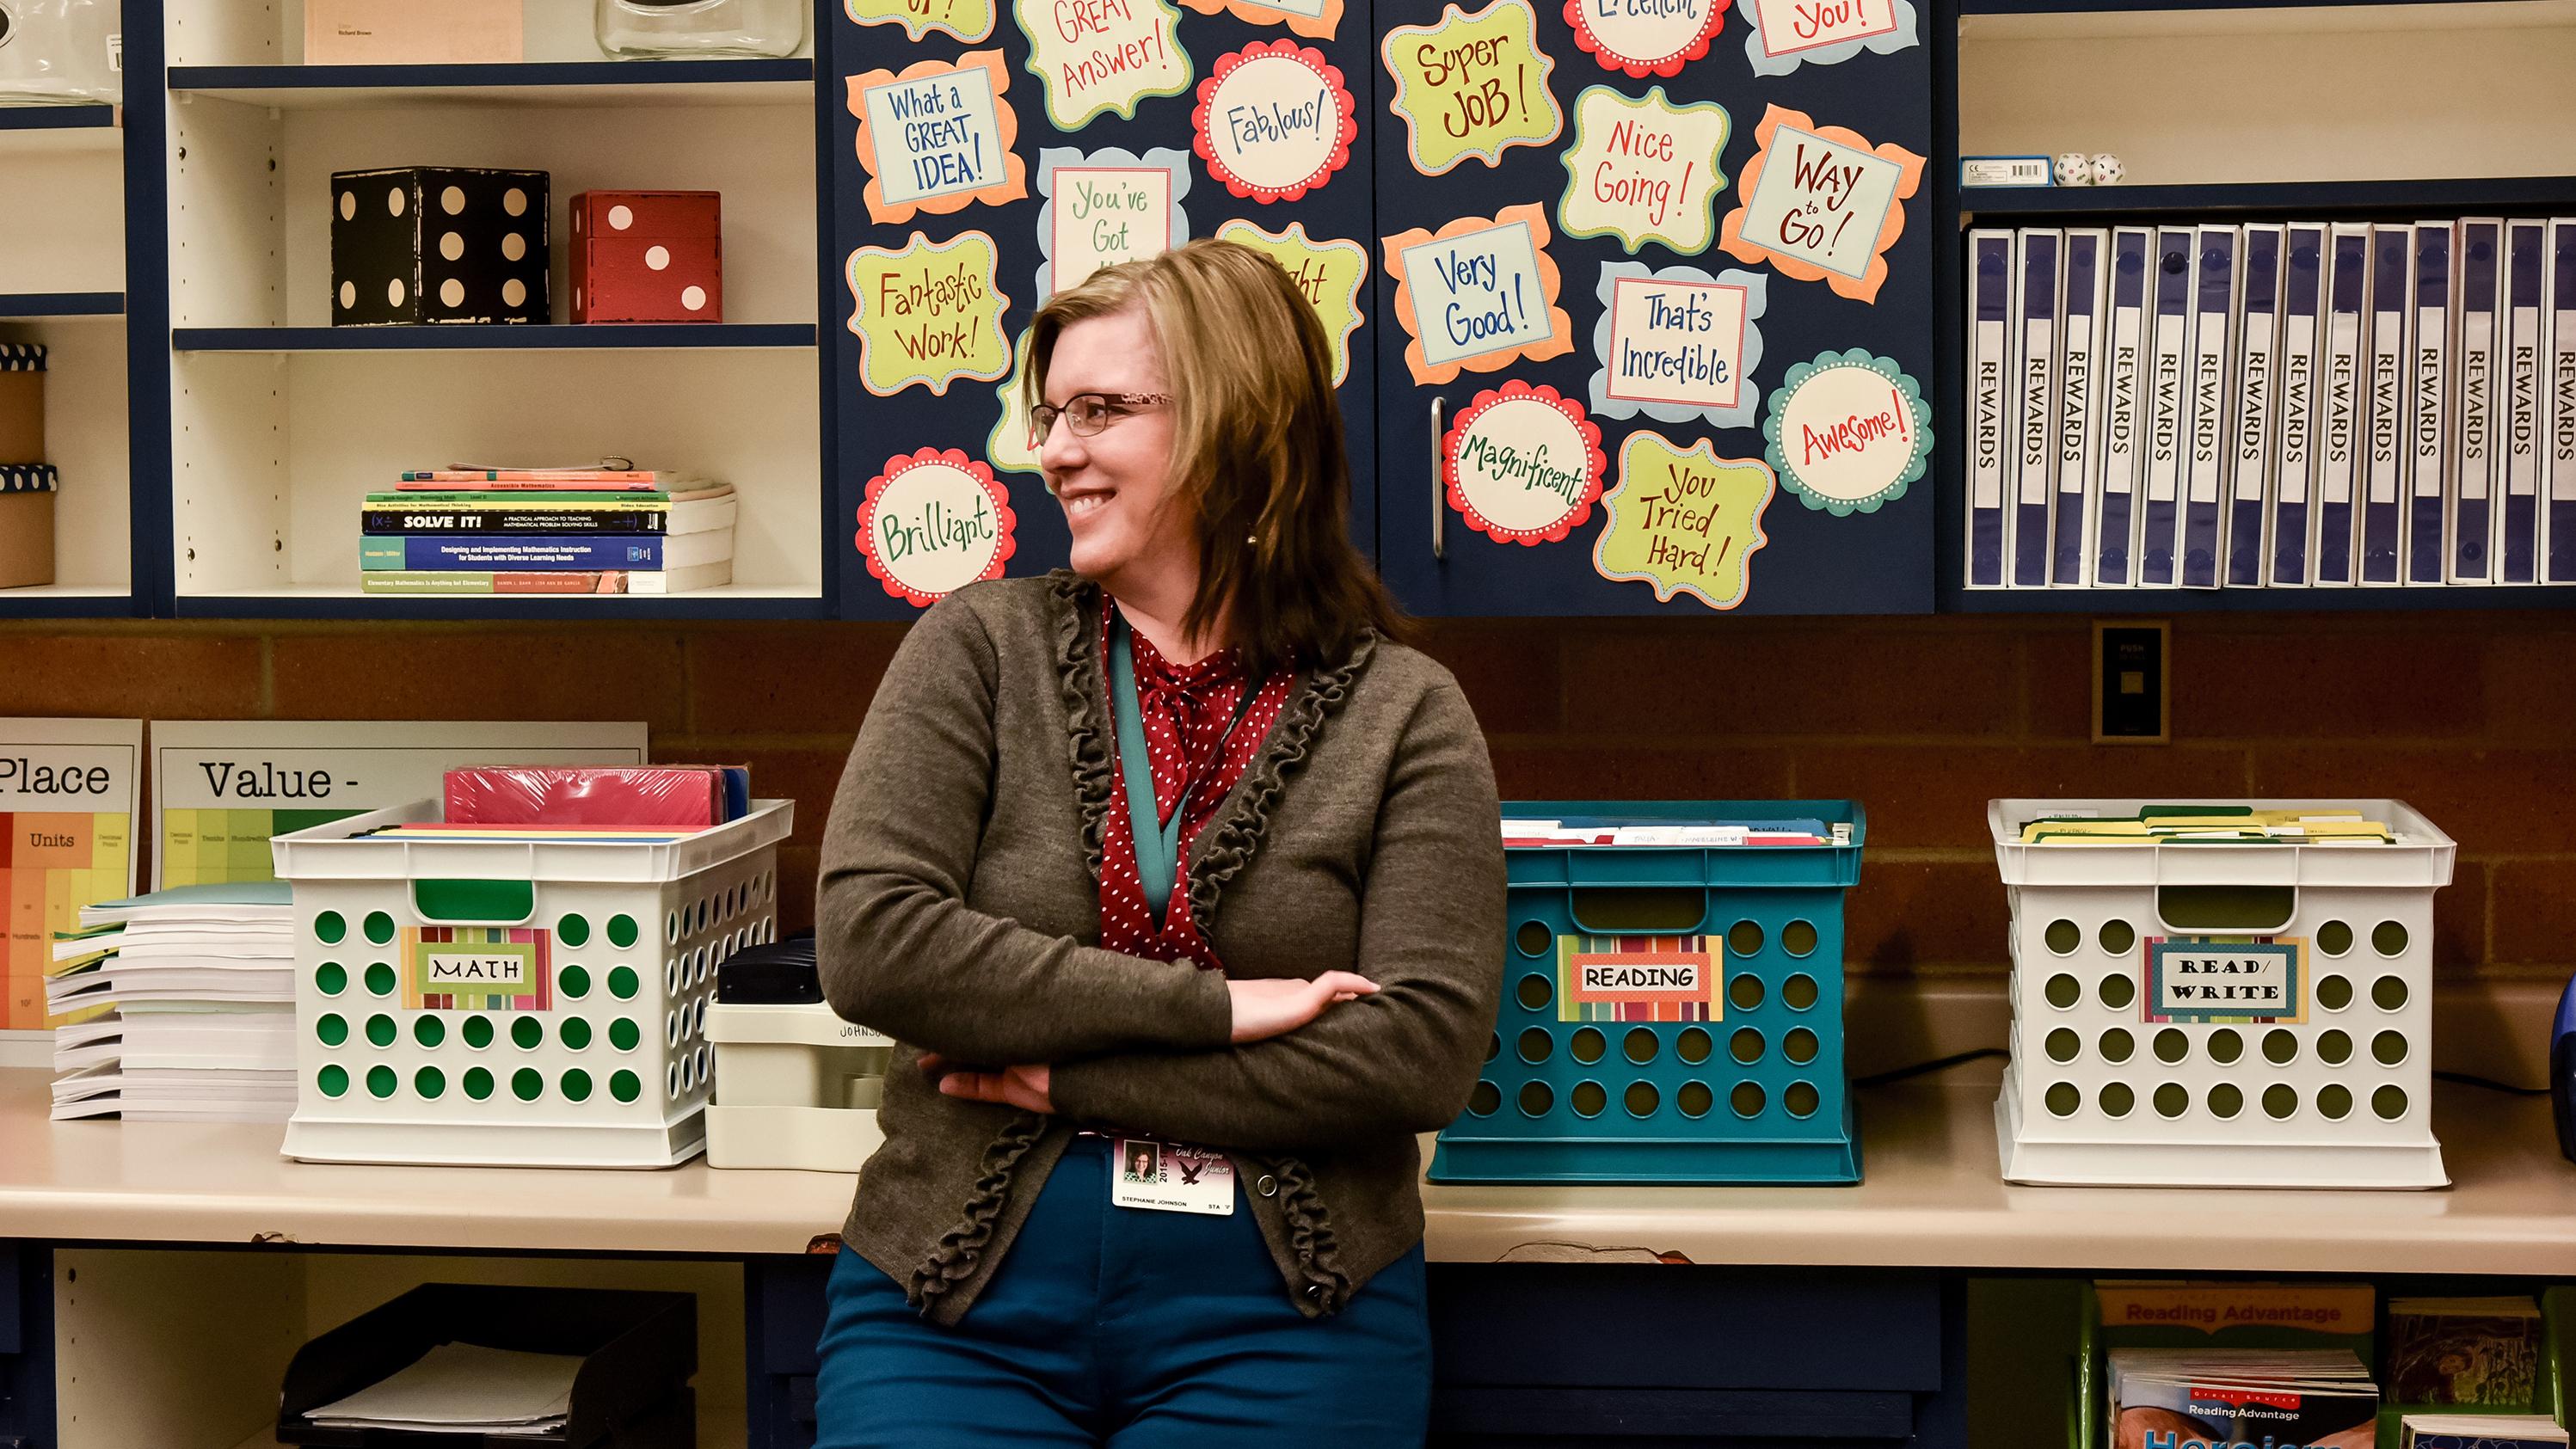 Itu0027s Not Easy Teaching Special Ed : NPR Ed : NPR